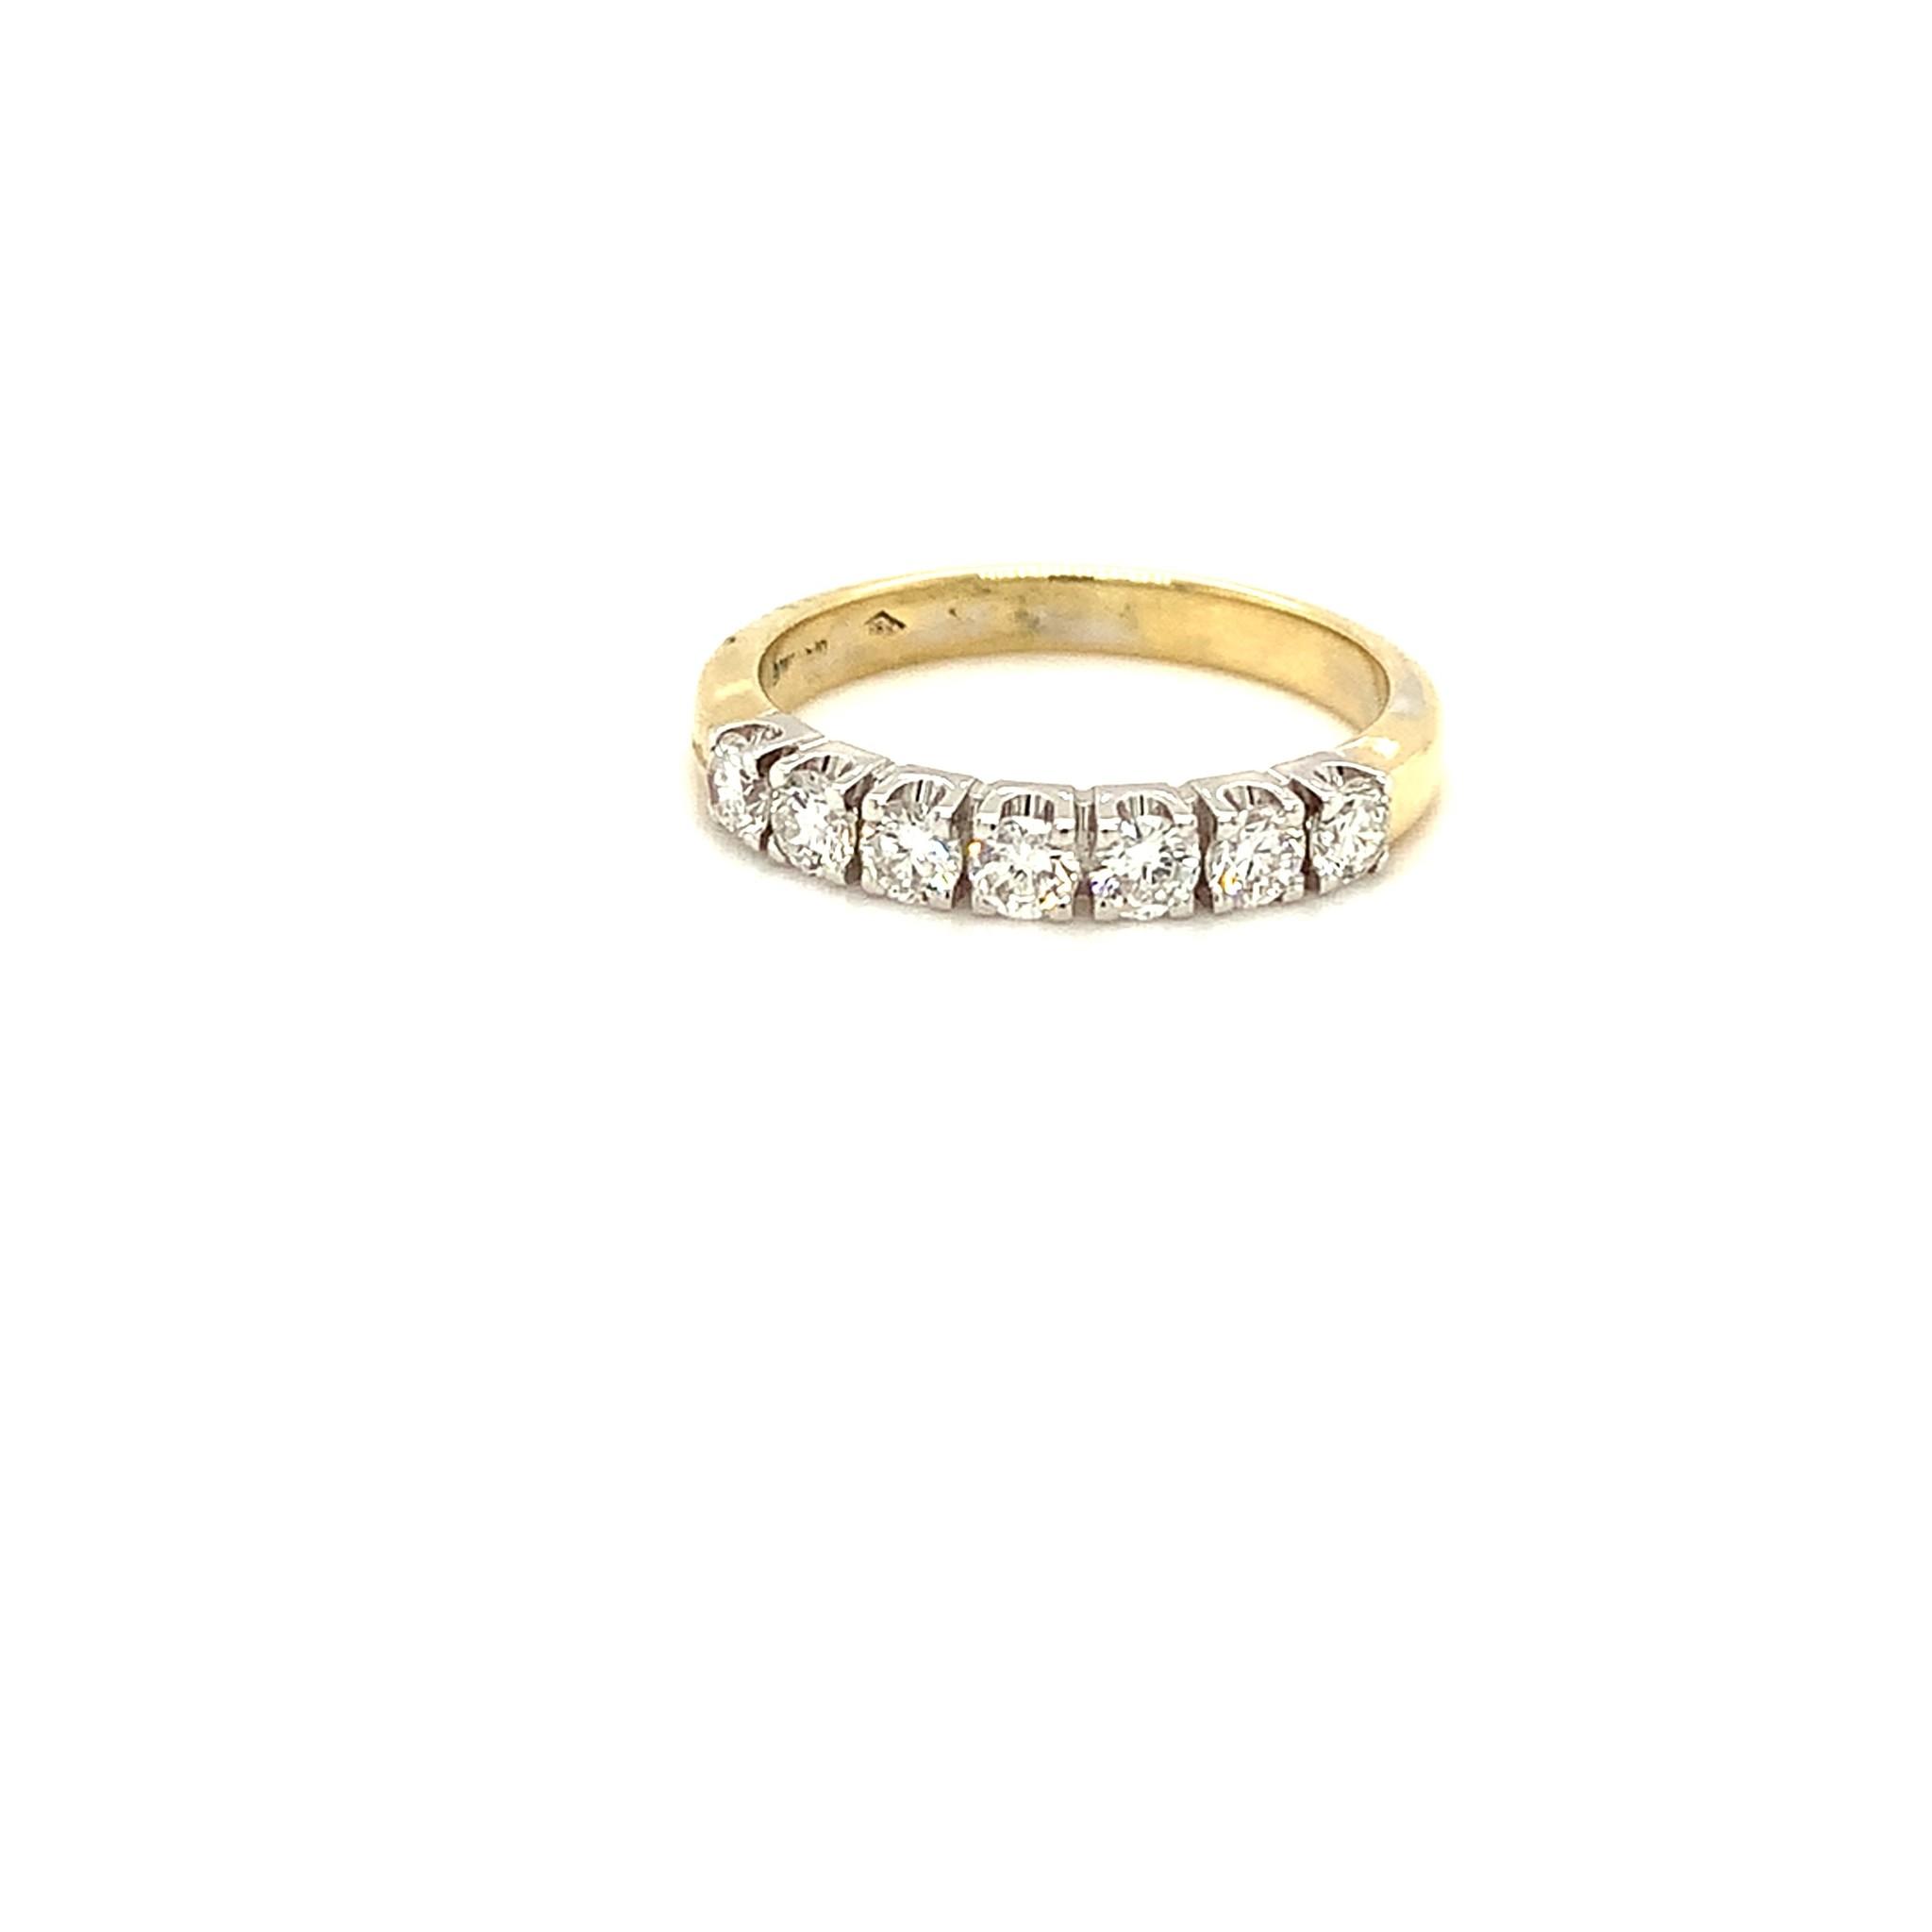 ROEMER ROEMER bicolor gouden Riviera ring met briljanten